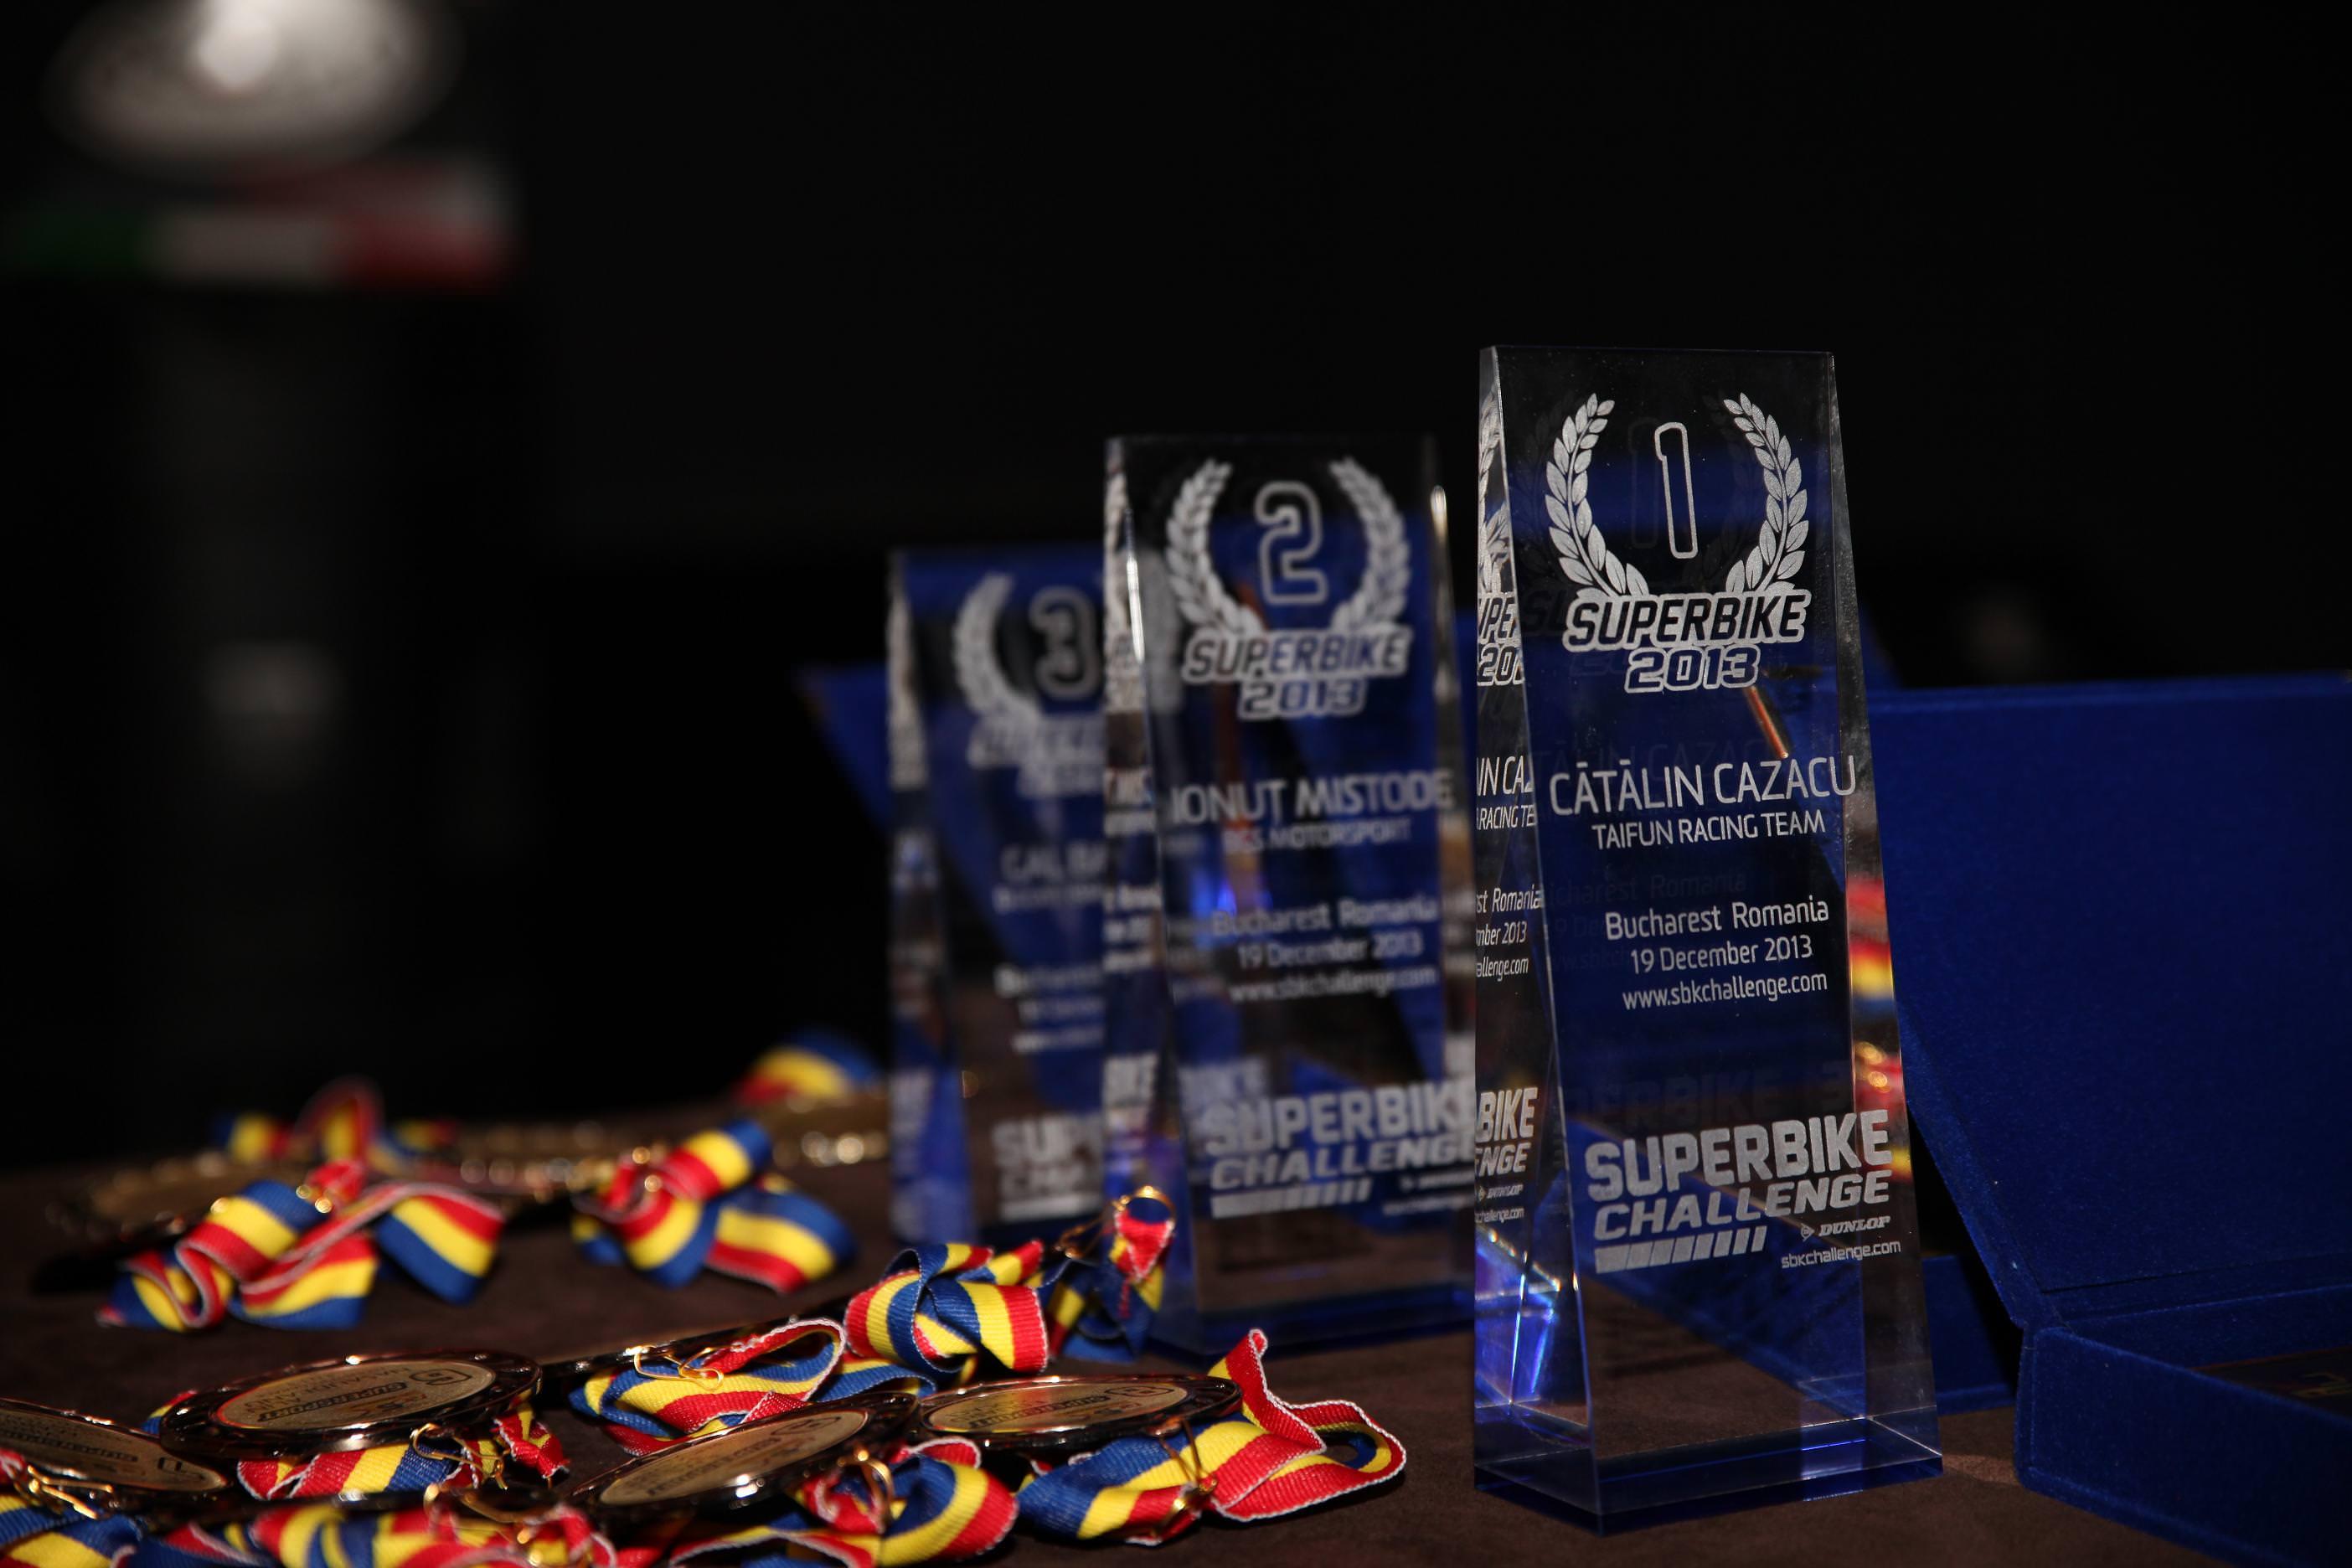 Cupa DUNLOP Romanian Superbike 2013 si-a premiat castigatorii